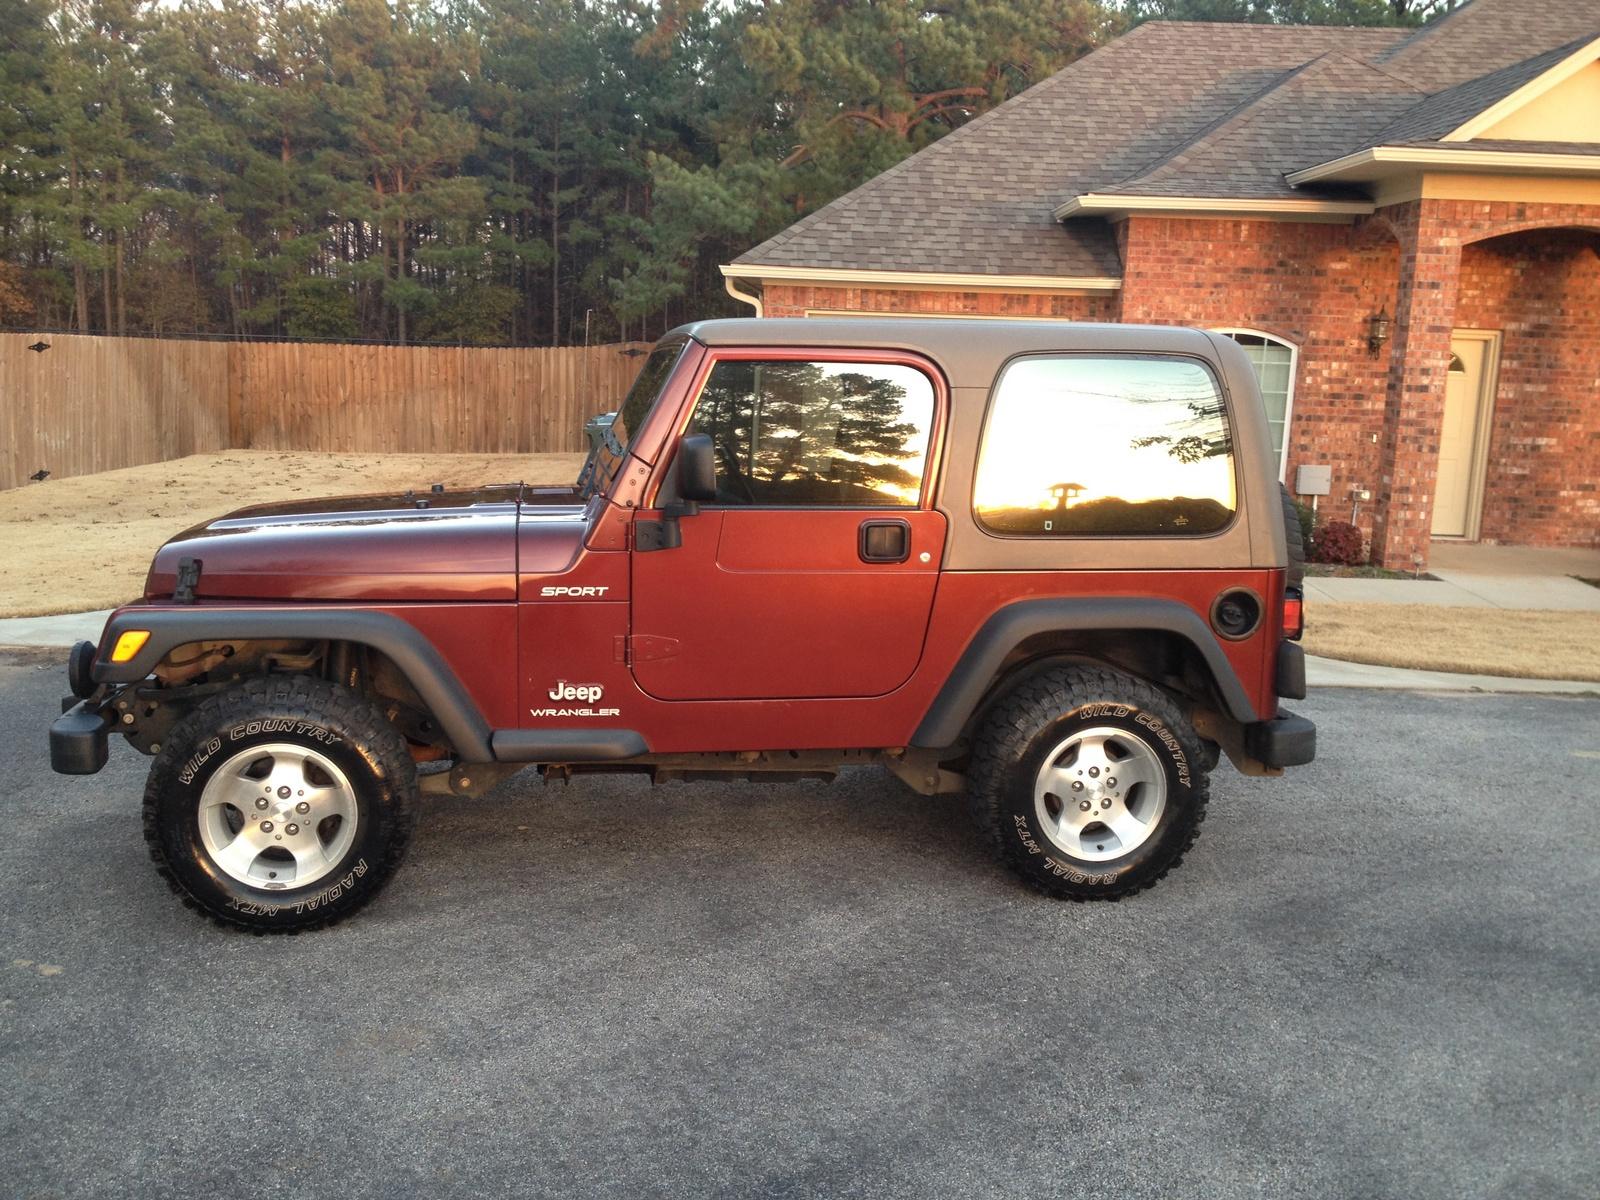 Picture of 2006 jeep wrangler rubicon exterior - 2003 Jeep Wrangler Pictures Cargurus